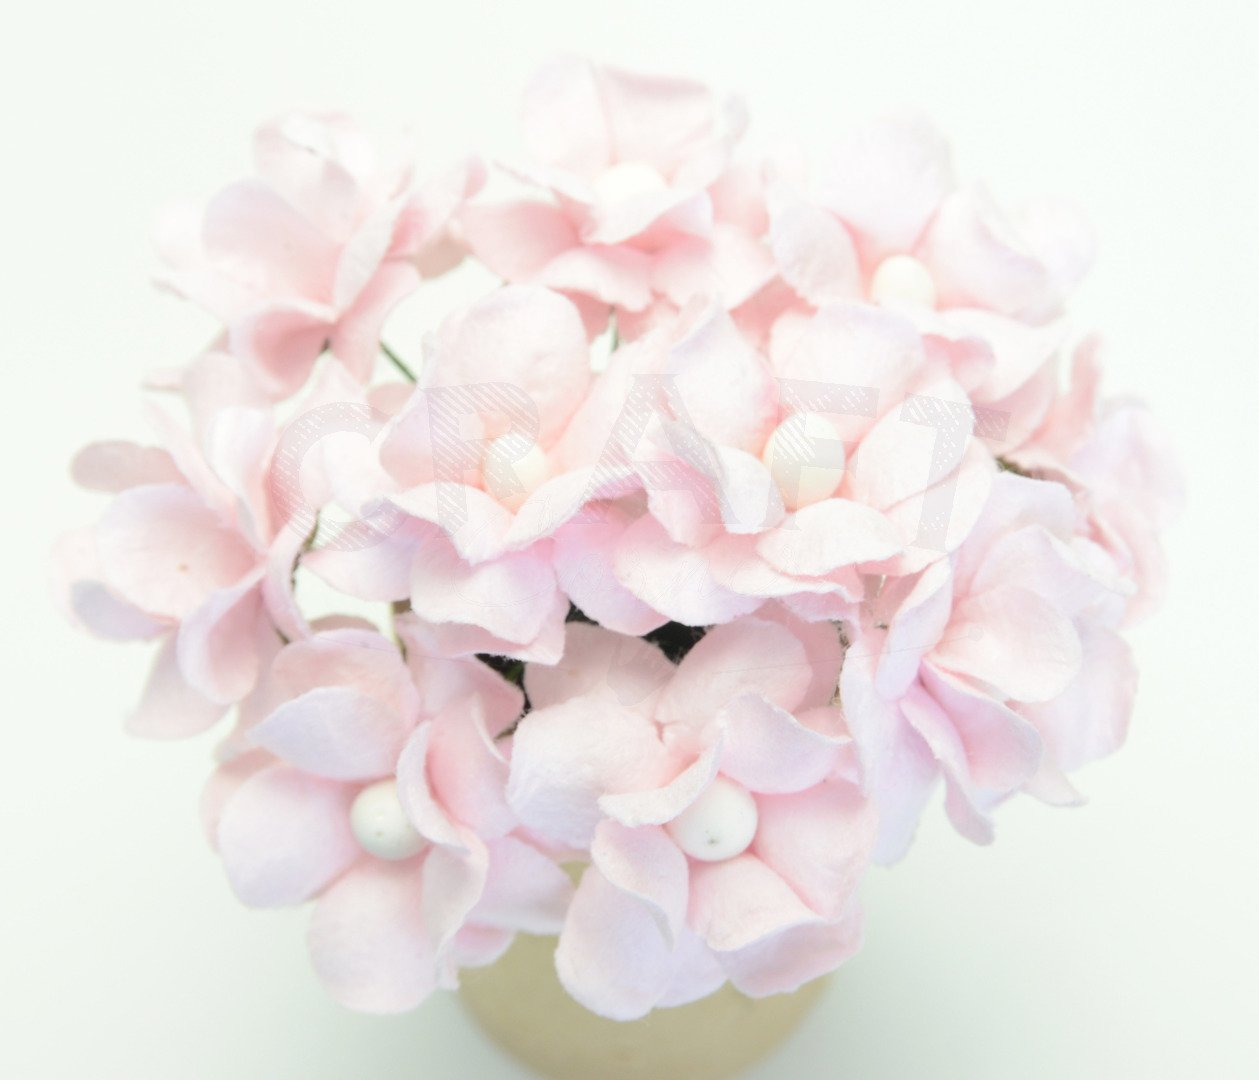 Filipinki Pale Pink Flowers 10pcs Kategorie Tematyczne Komunia